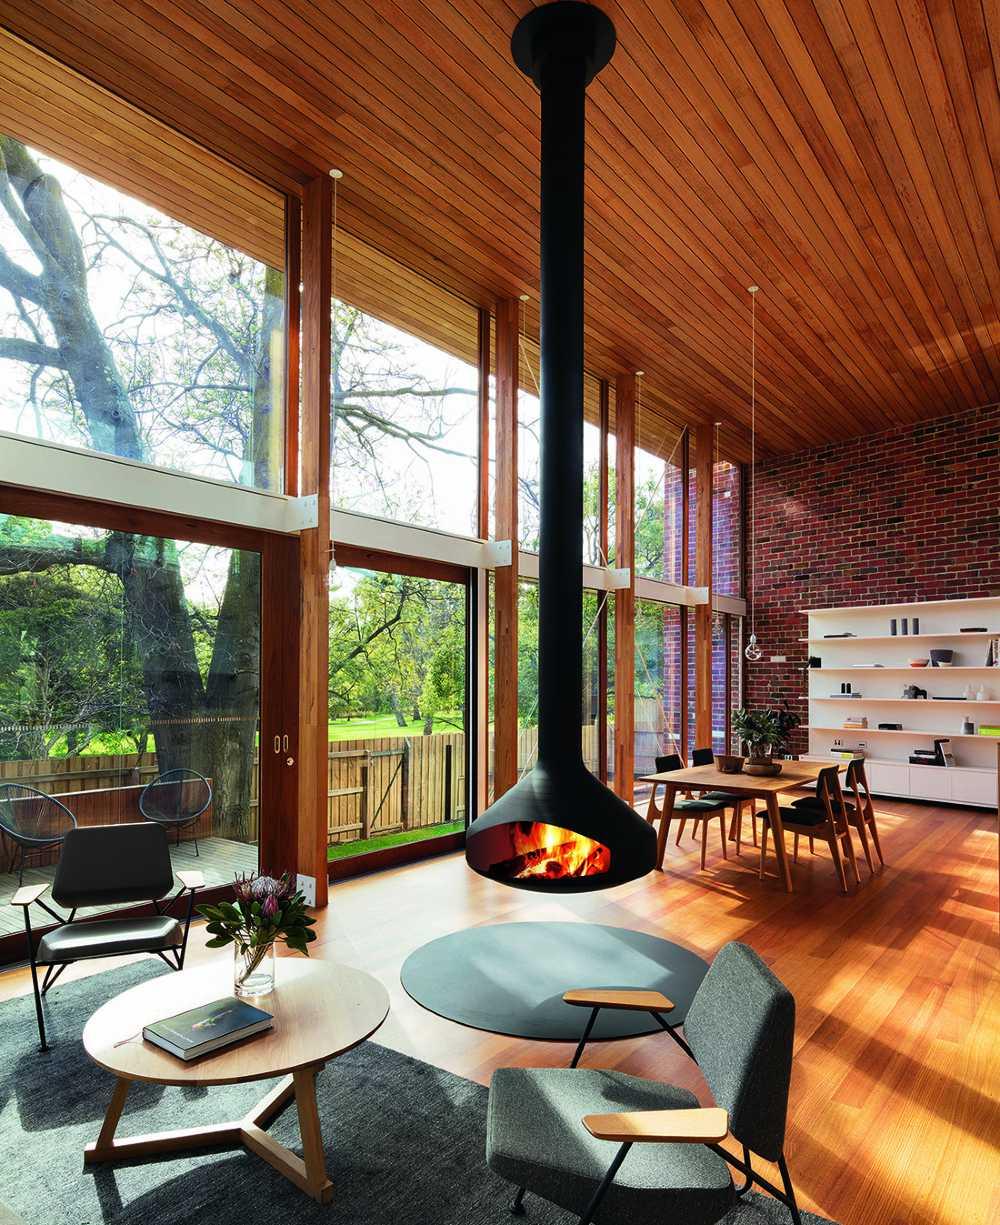 SVAI_stufa a legna moderna di design da soffitto alto